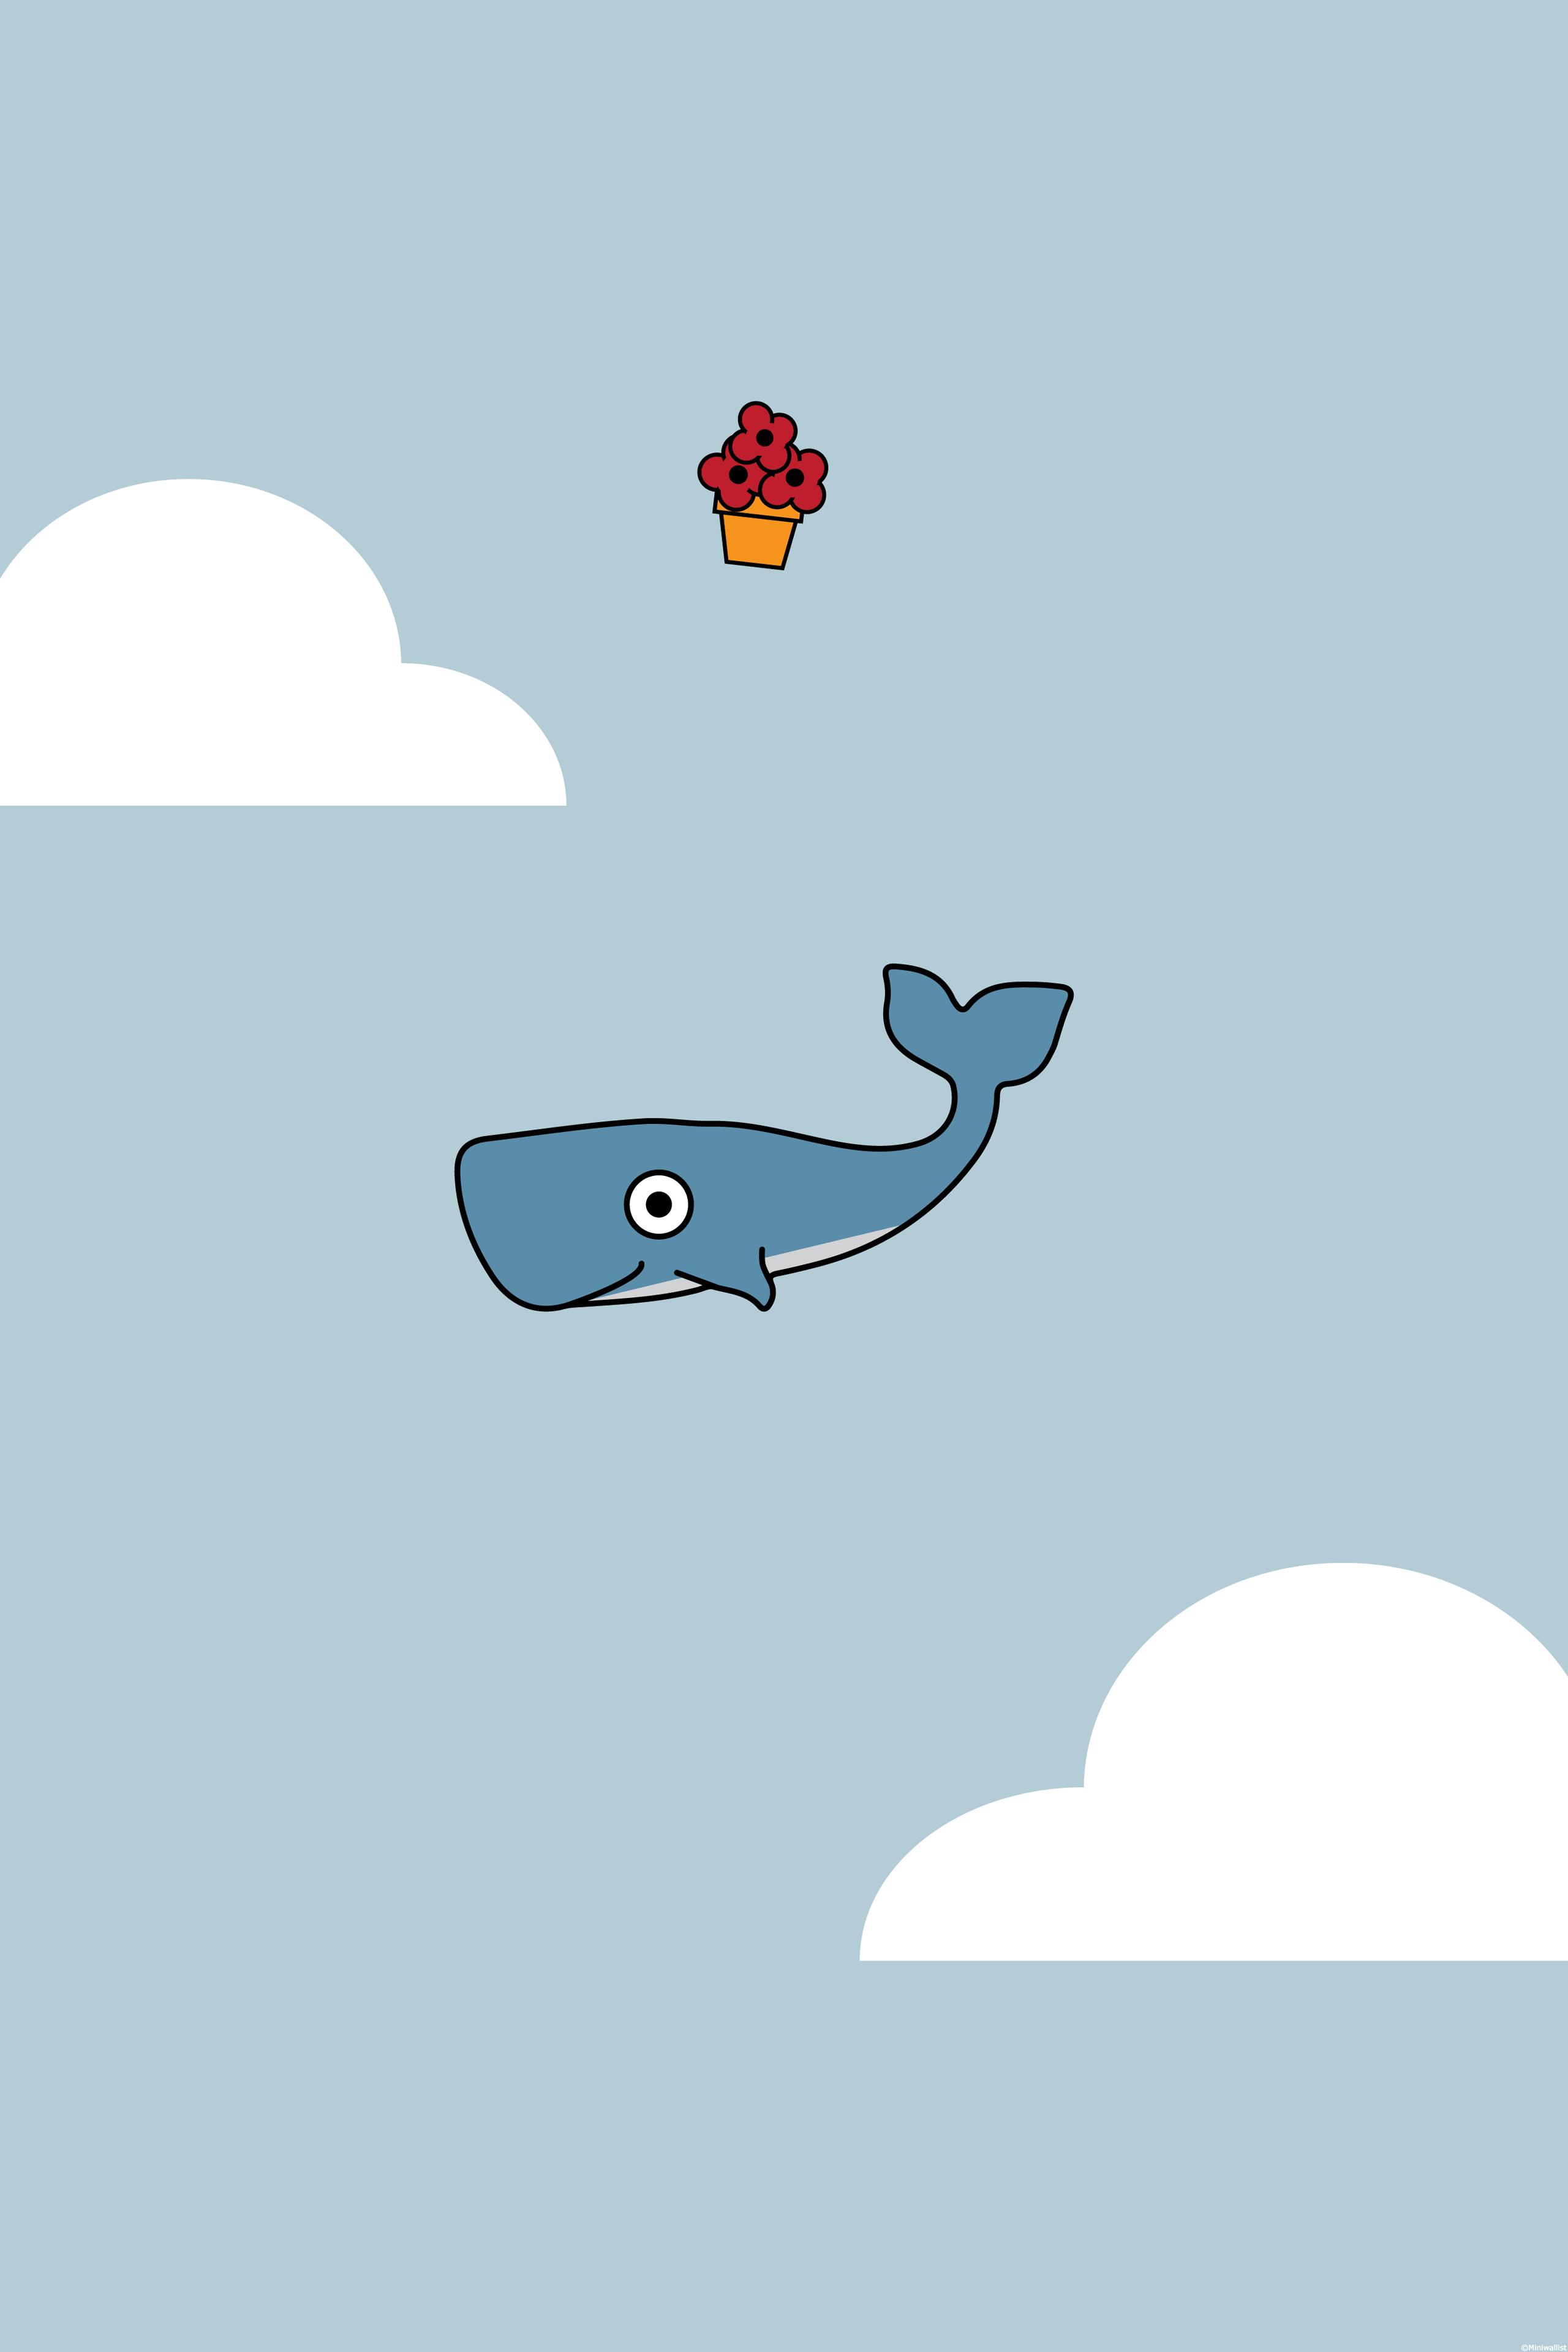 hitchhiker s whale mobile wallpaper miniwallist rh miniwallist com Cute iPhone Wallpapers Girly iPhone Wallpaper